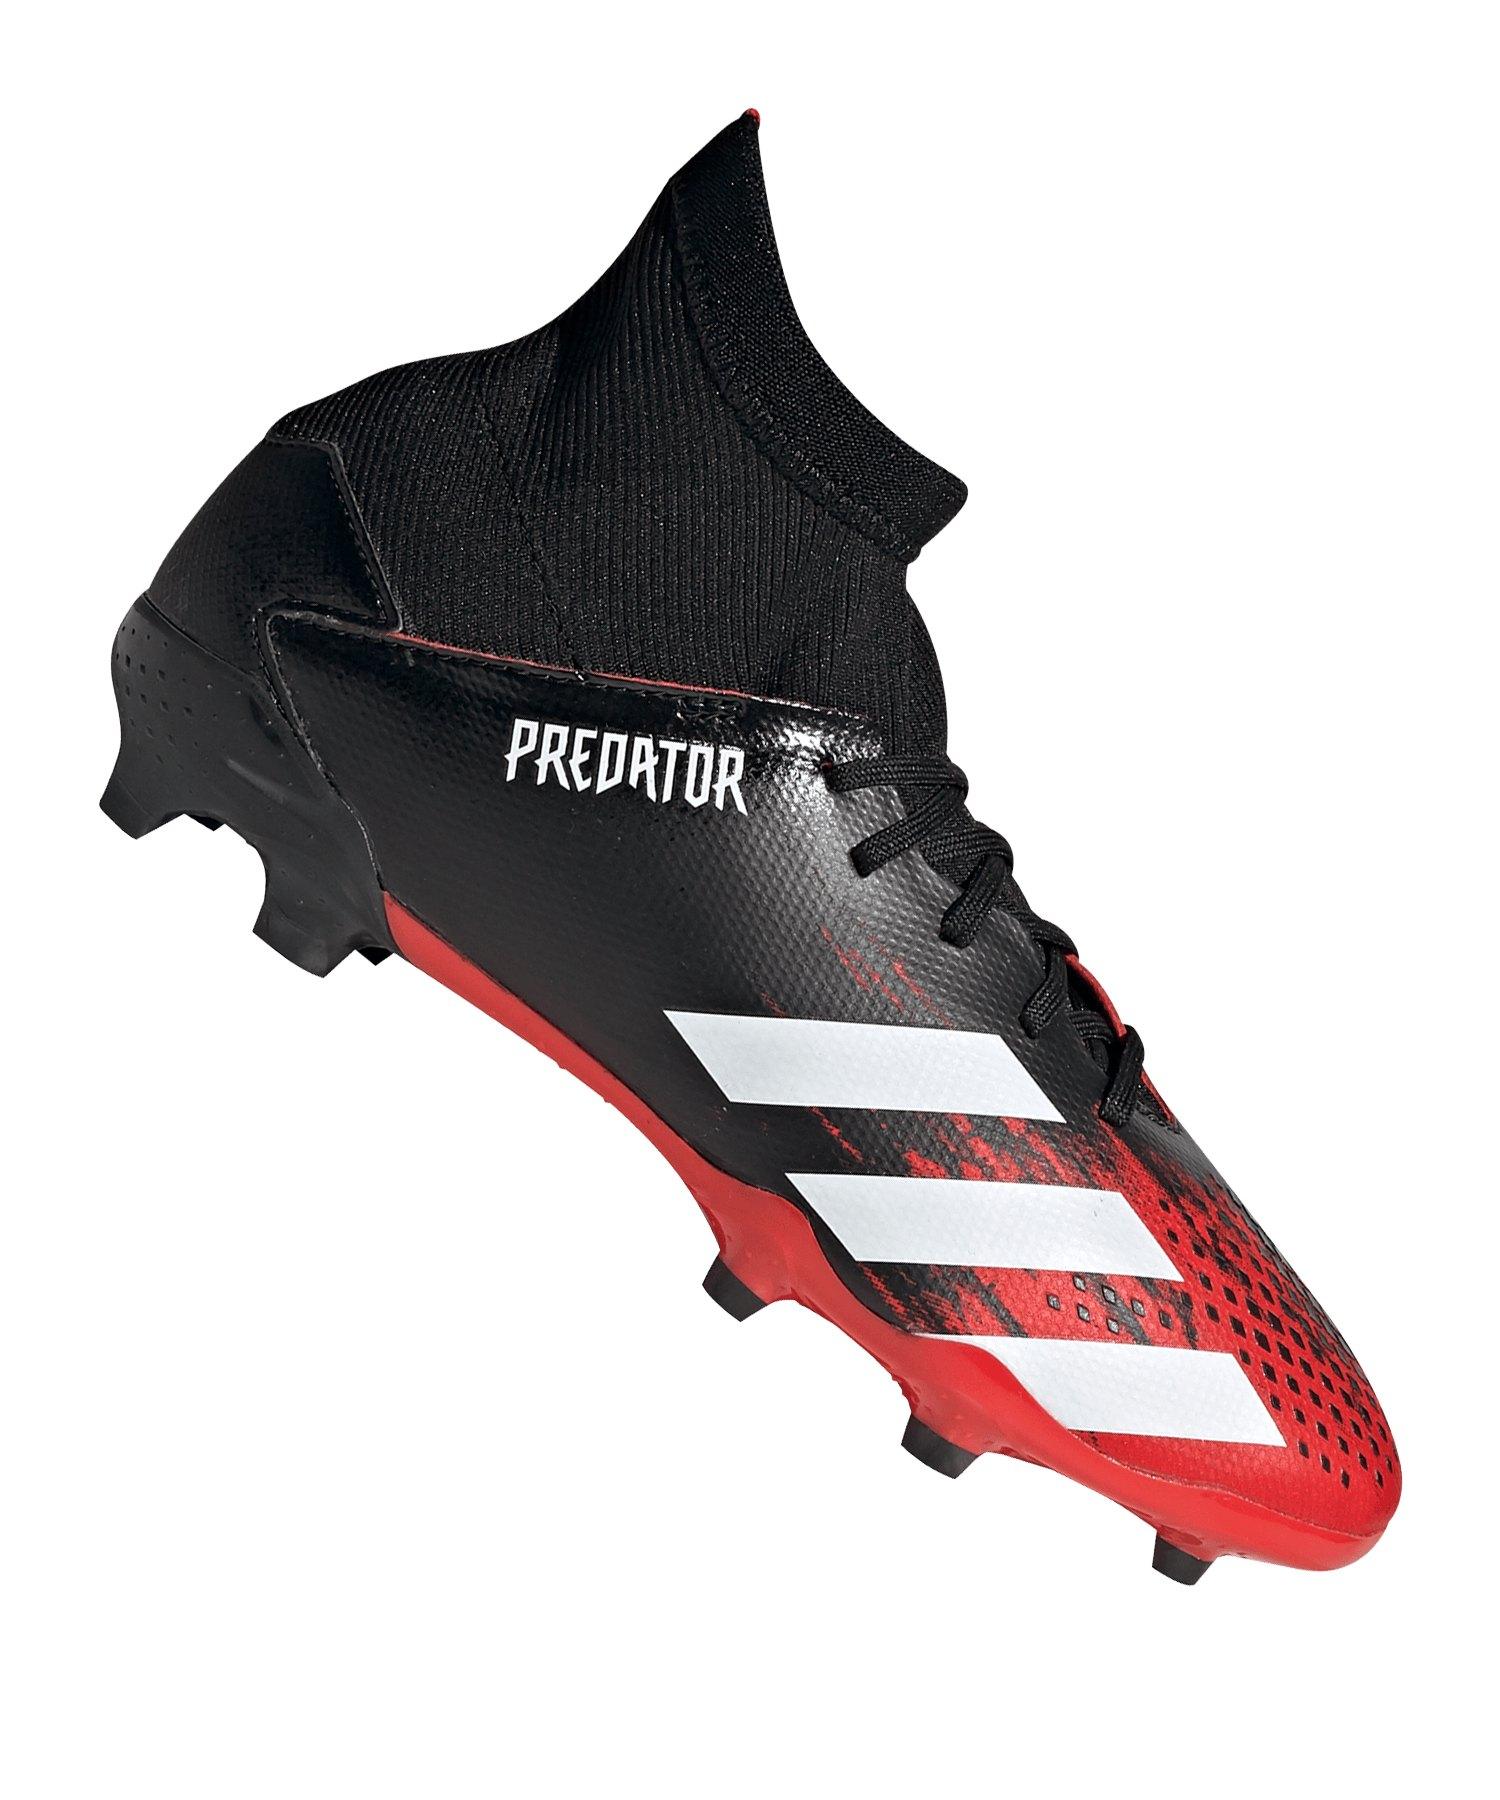 adidas Predator 20.3 FG J Kids Schwarz Weiss - schwarz